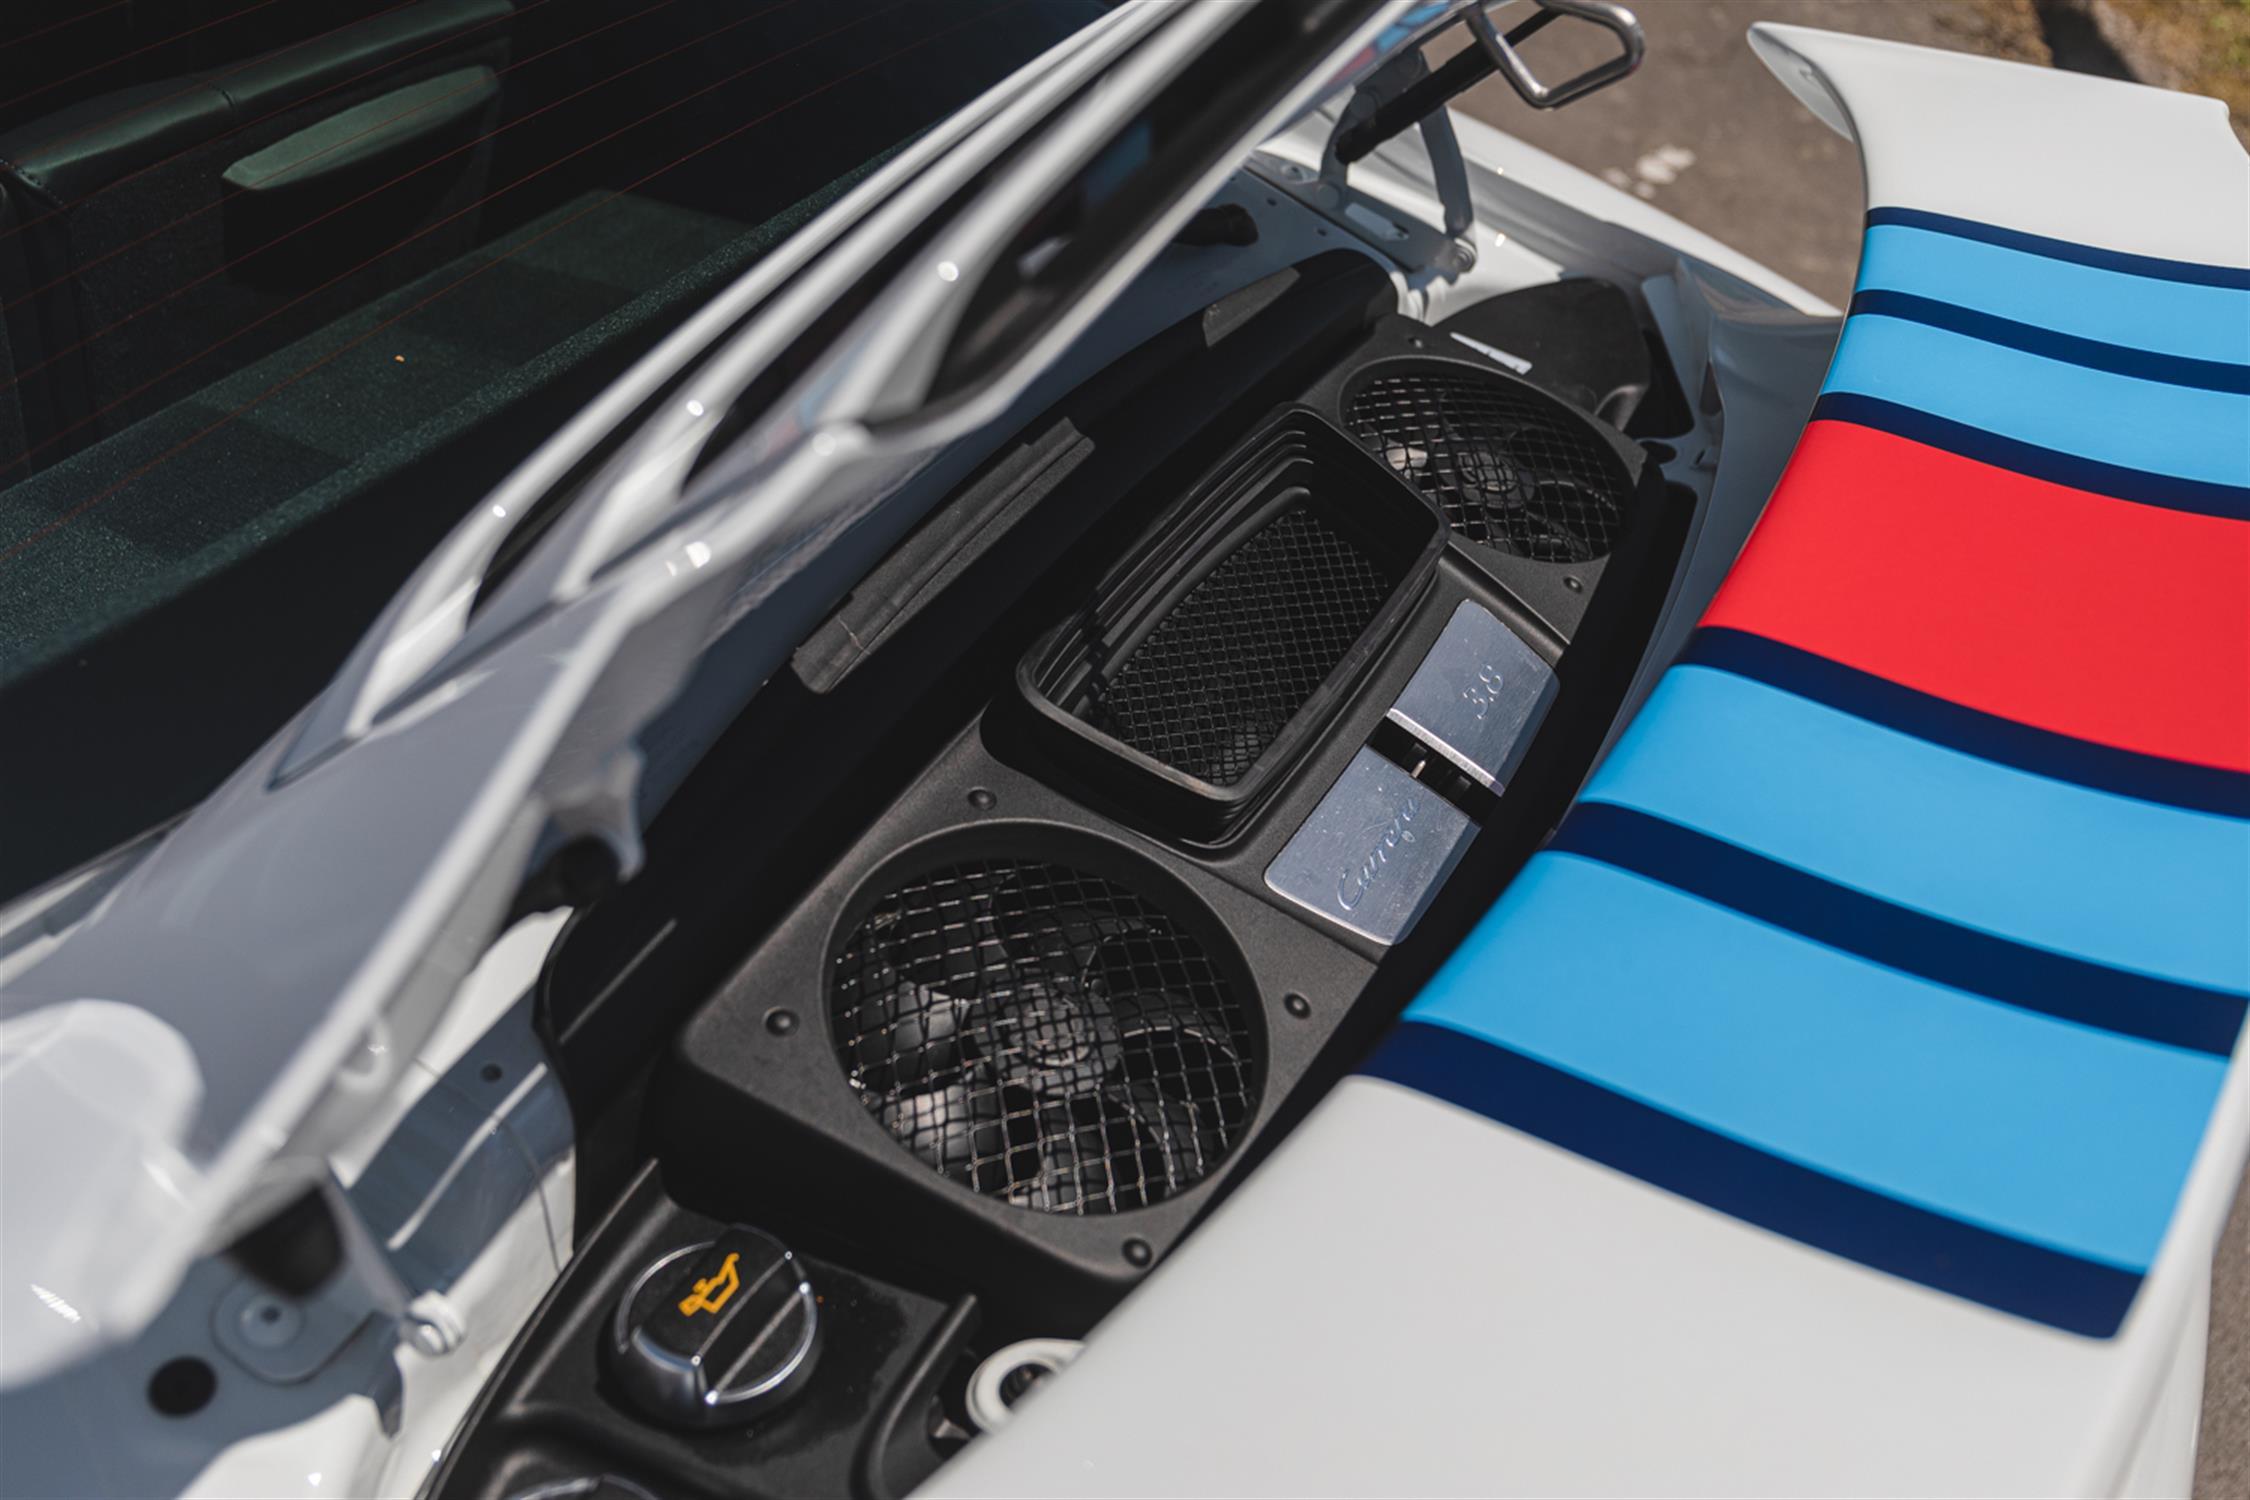 2014 Porsche 911 (991) 3.8 Martini Racing Edition (RHD) - Image 9 of 10